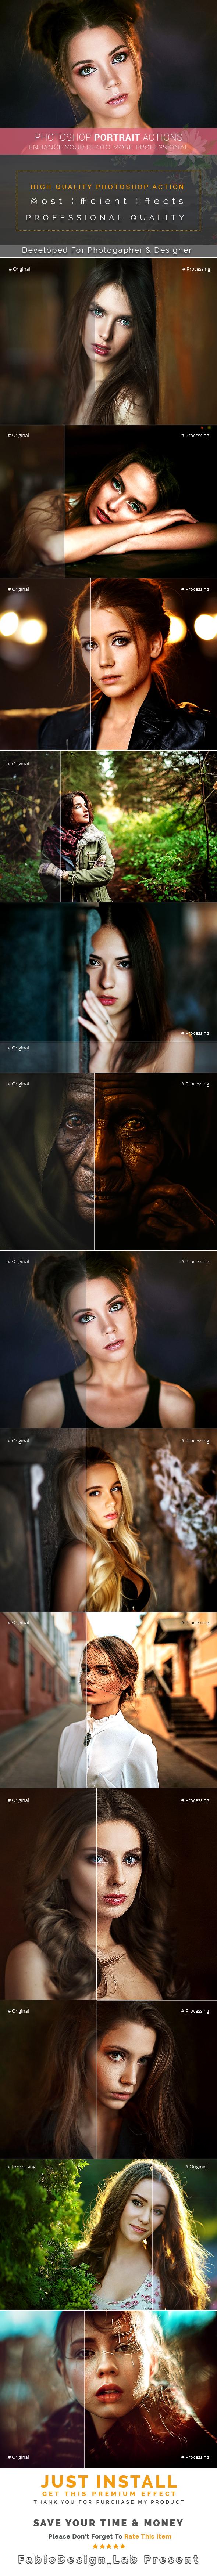 Photoshop Portrait Actions - Photo Effects Actions